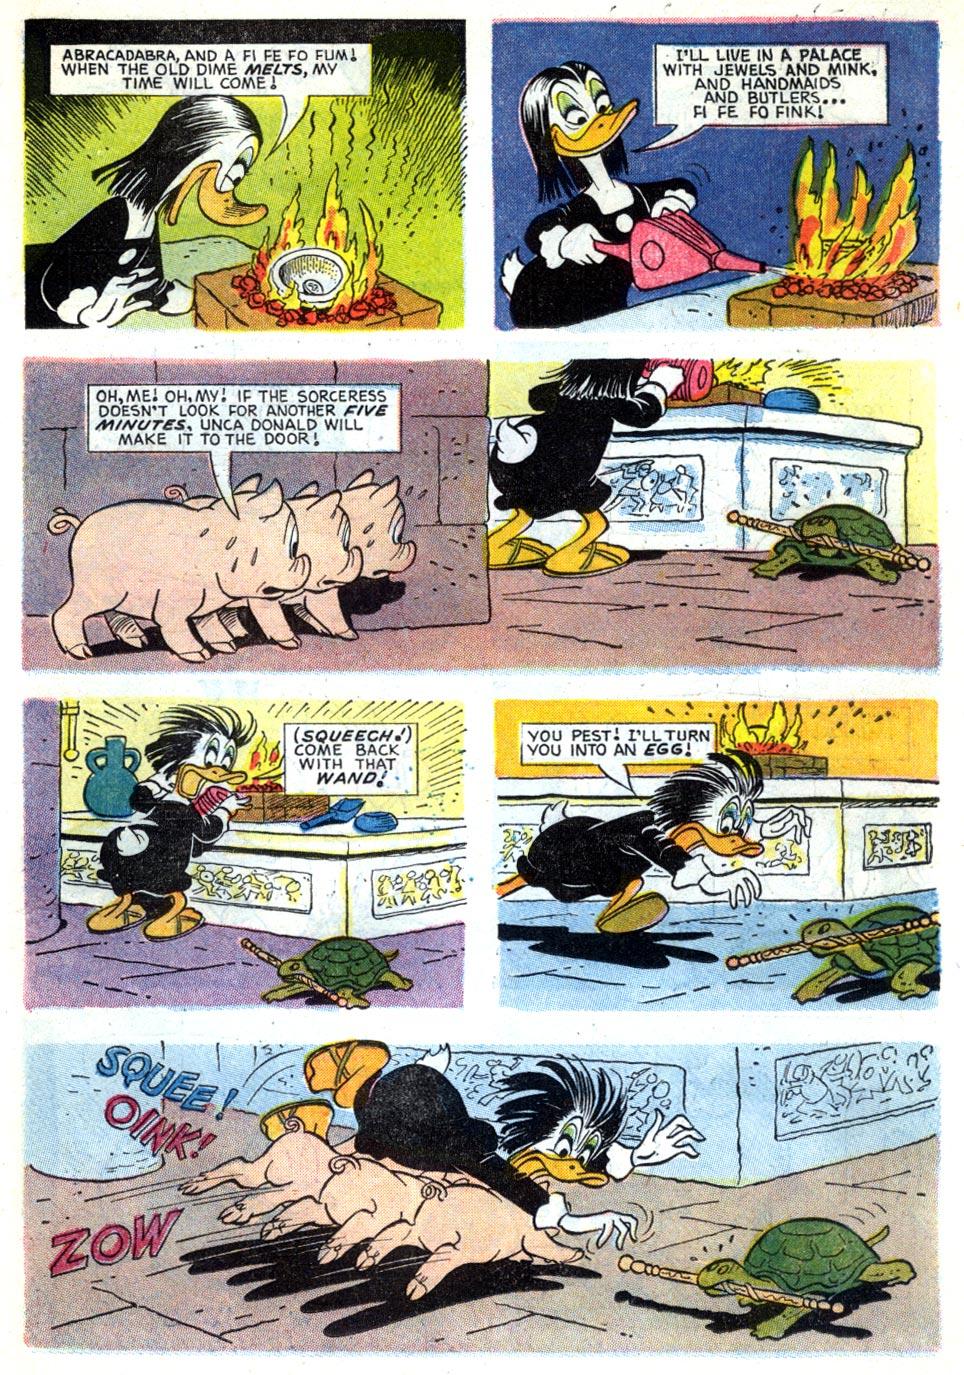 (1953) Issue #329 </opti #365 - English 19